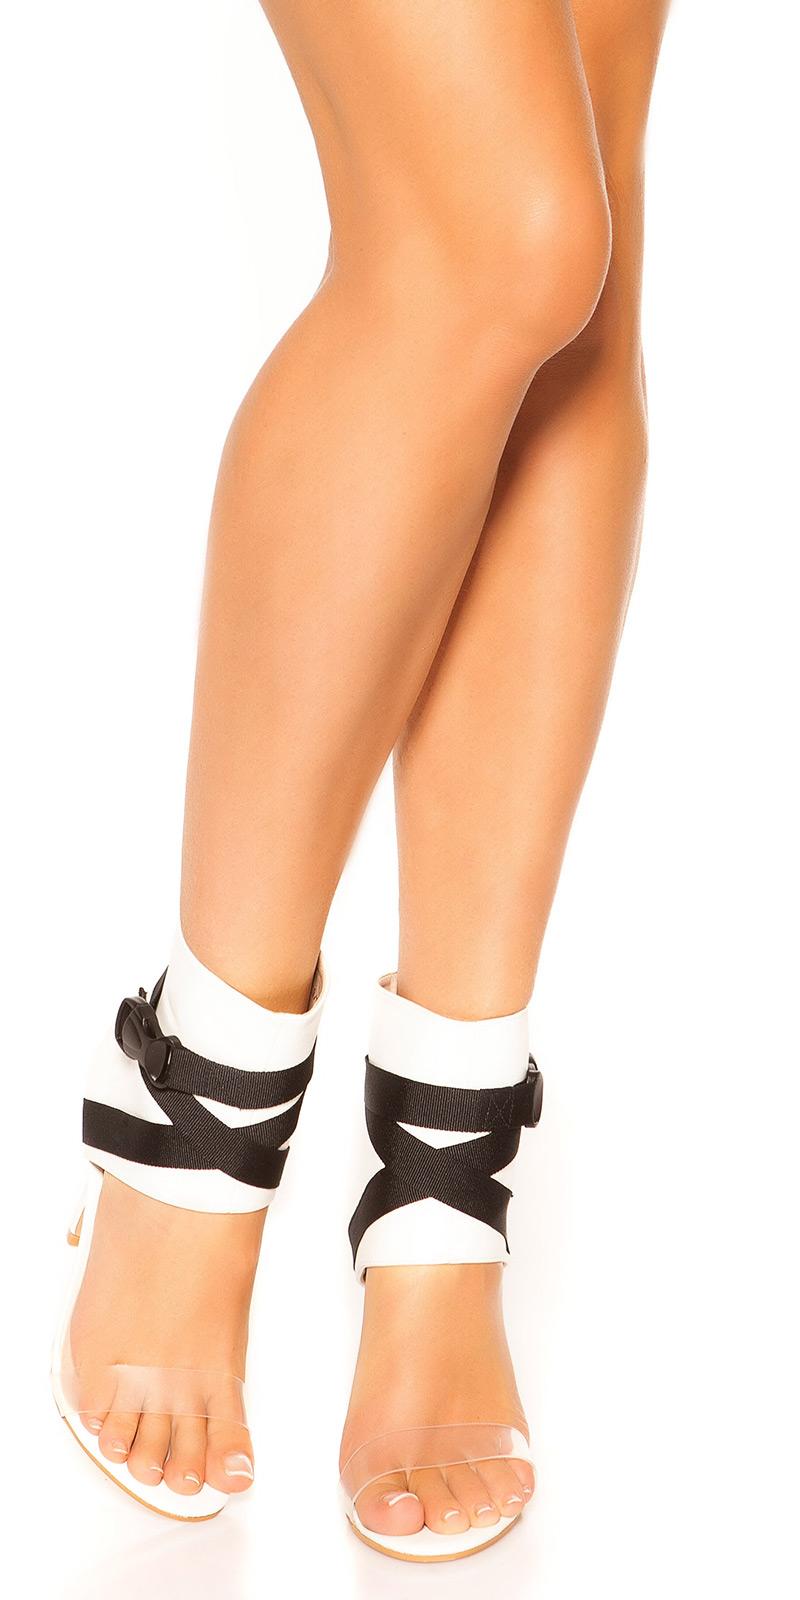 Sandale Sexy Ankle cu toc Stiletto